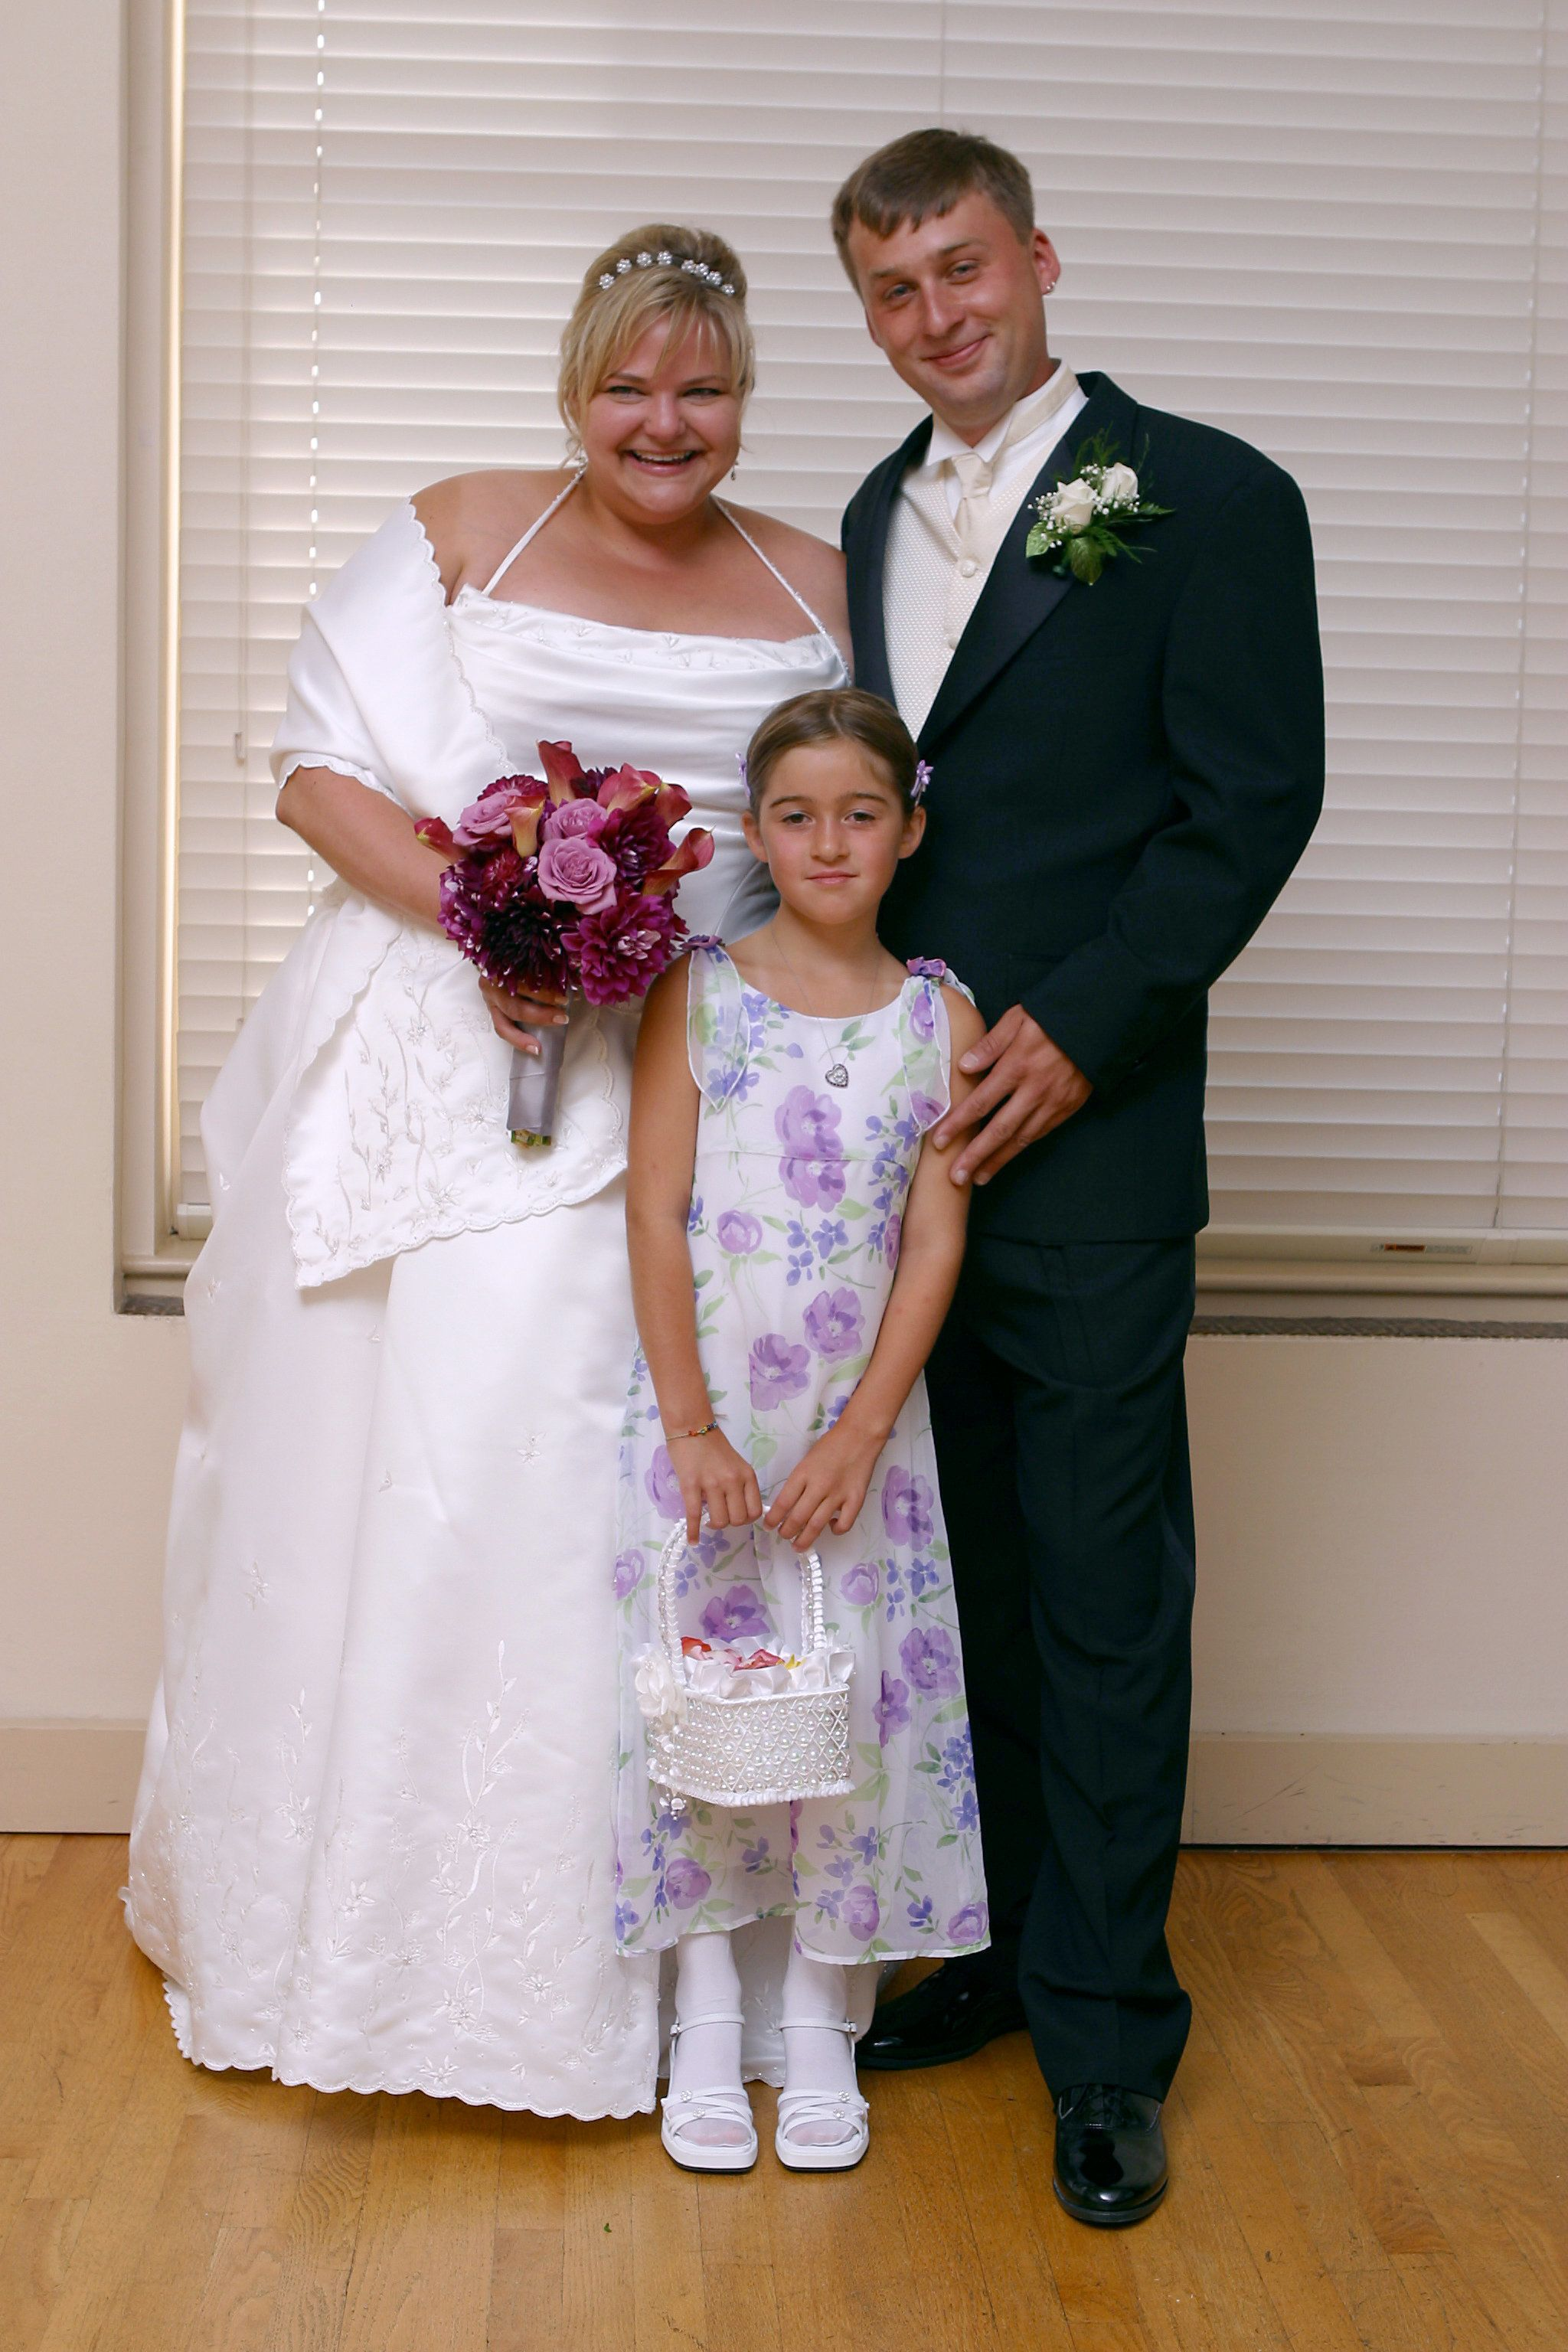 Writer Katherine Hedland Hansen on her wedding day in 2003. Her stepdaughter Haley served as flower girl.